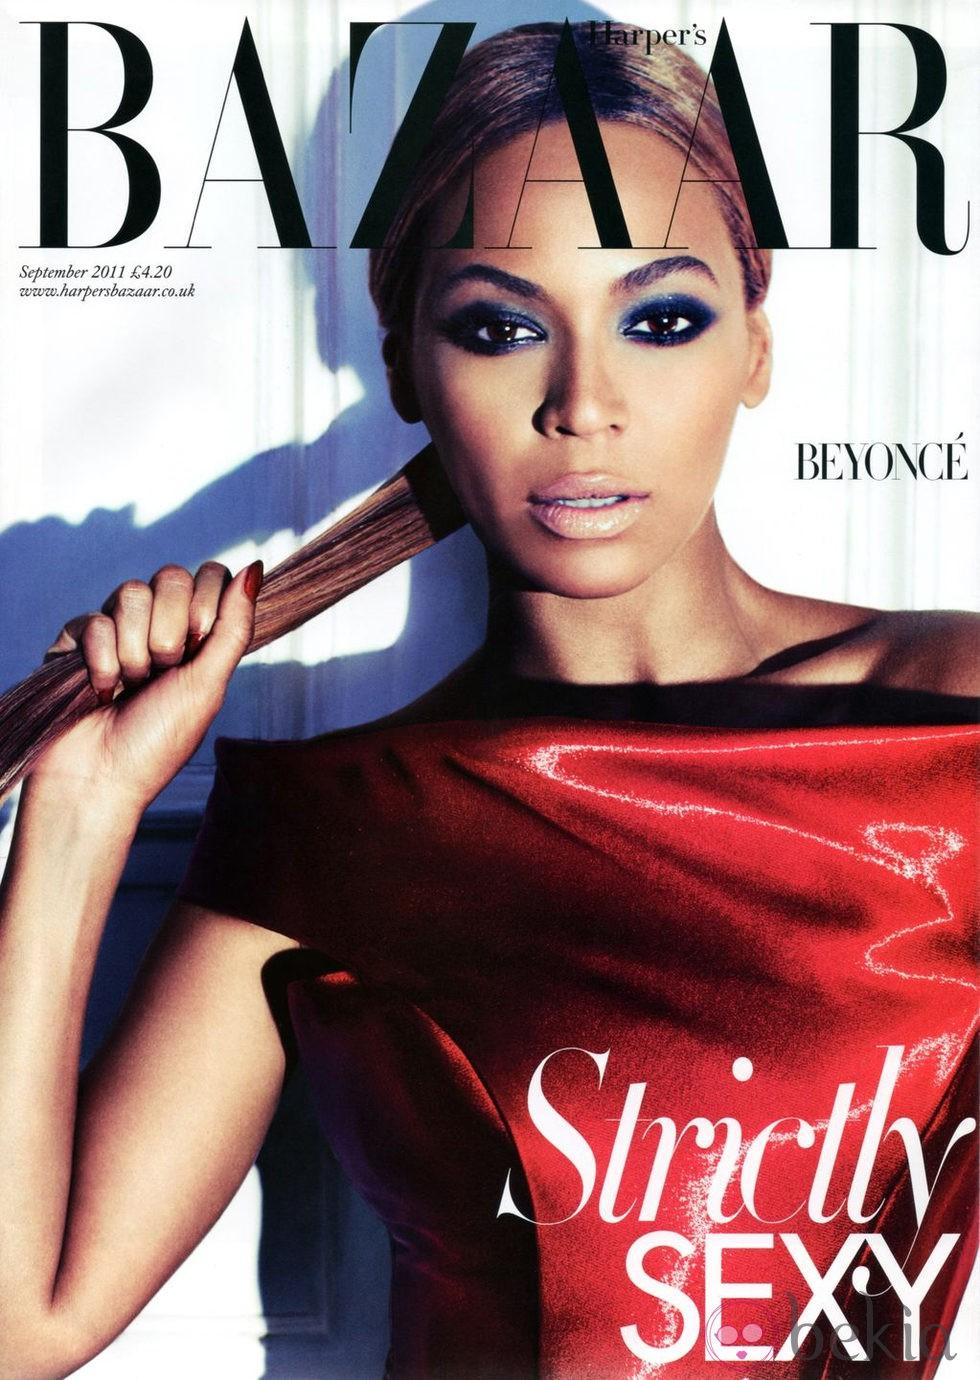 Beyonce, portada de Harper's Bazaar UK en septiembre de 2011